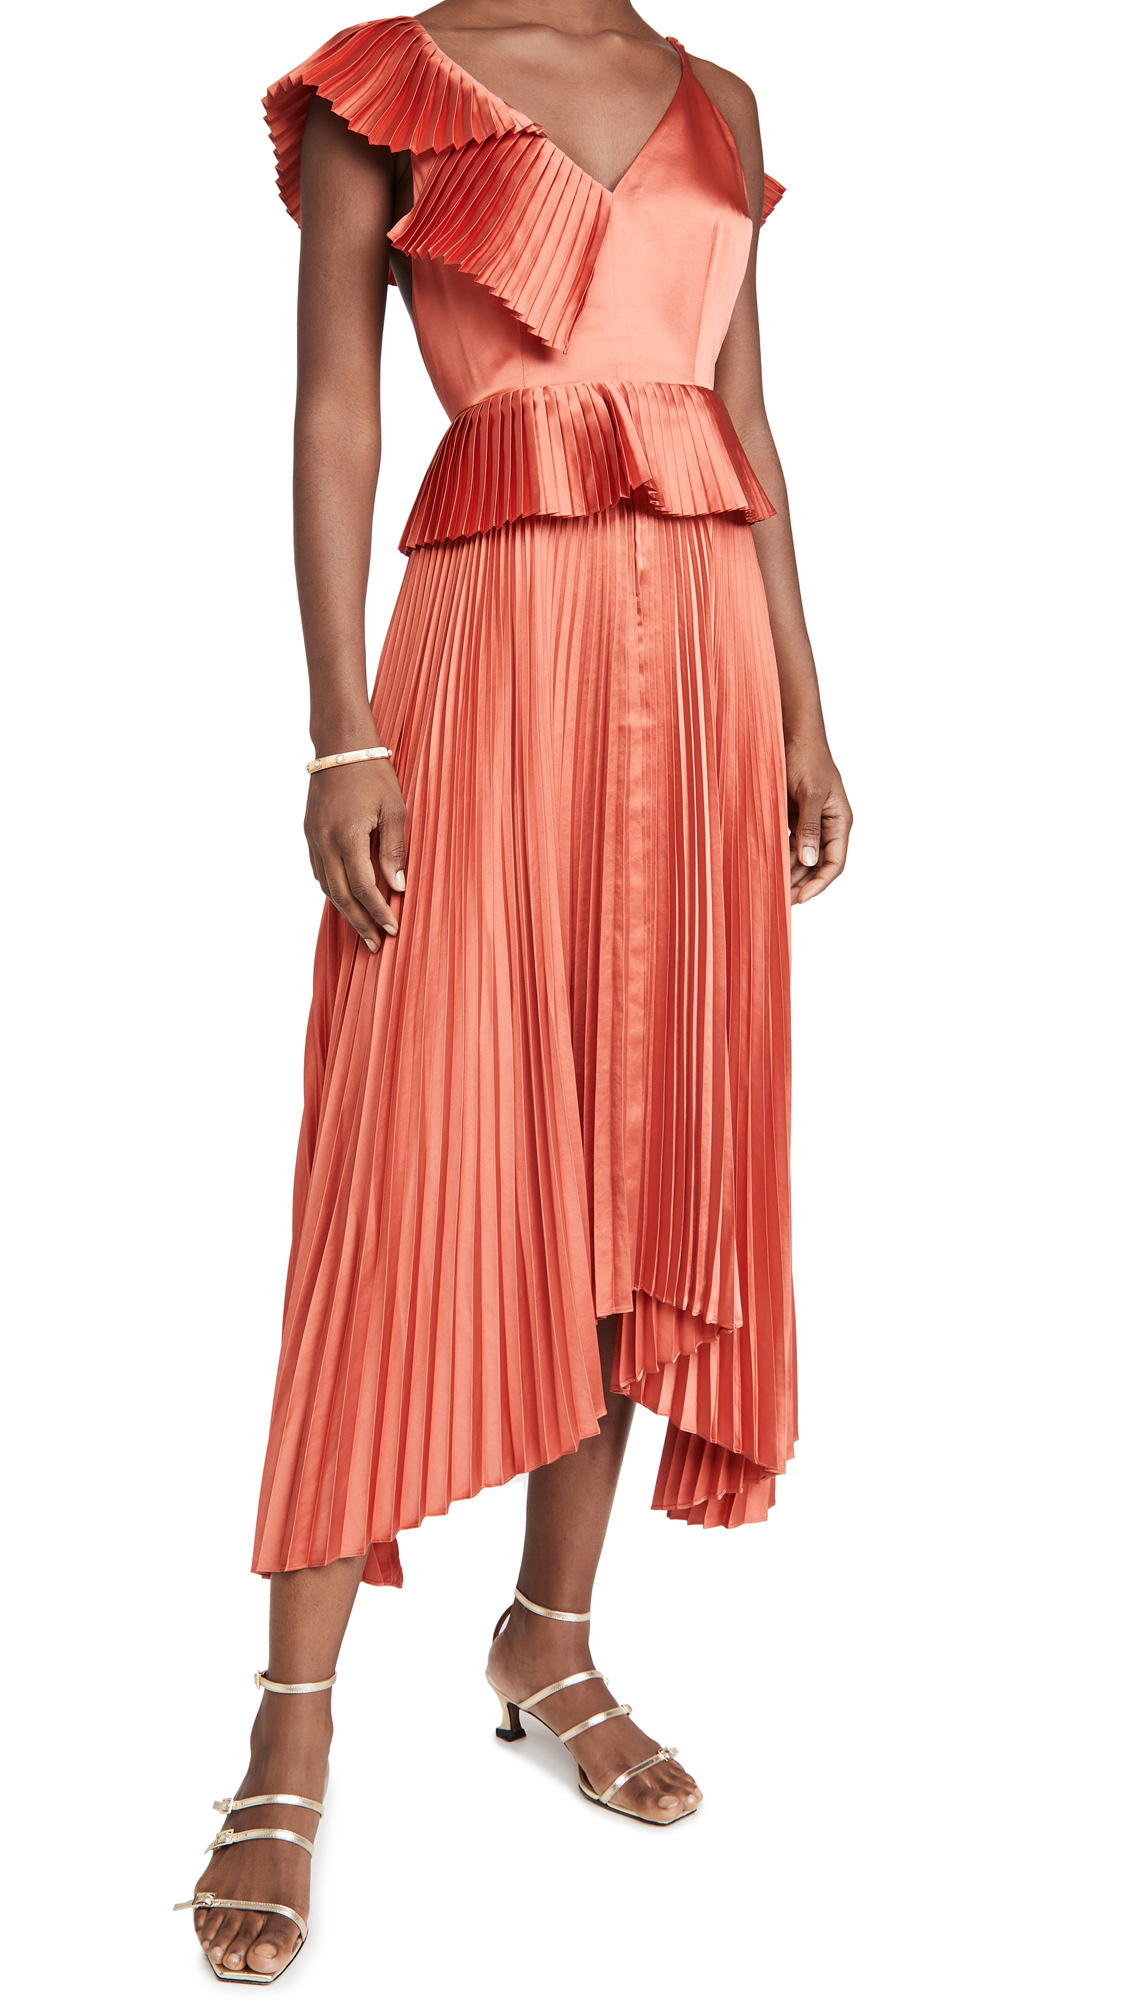 Amur Liliana Dress